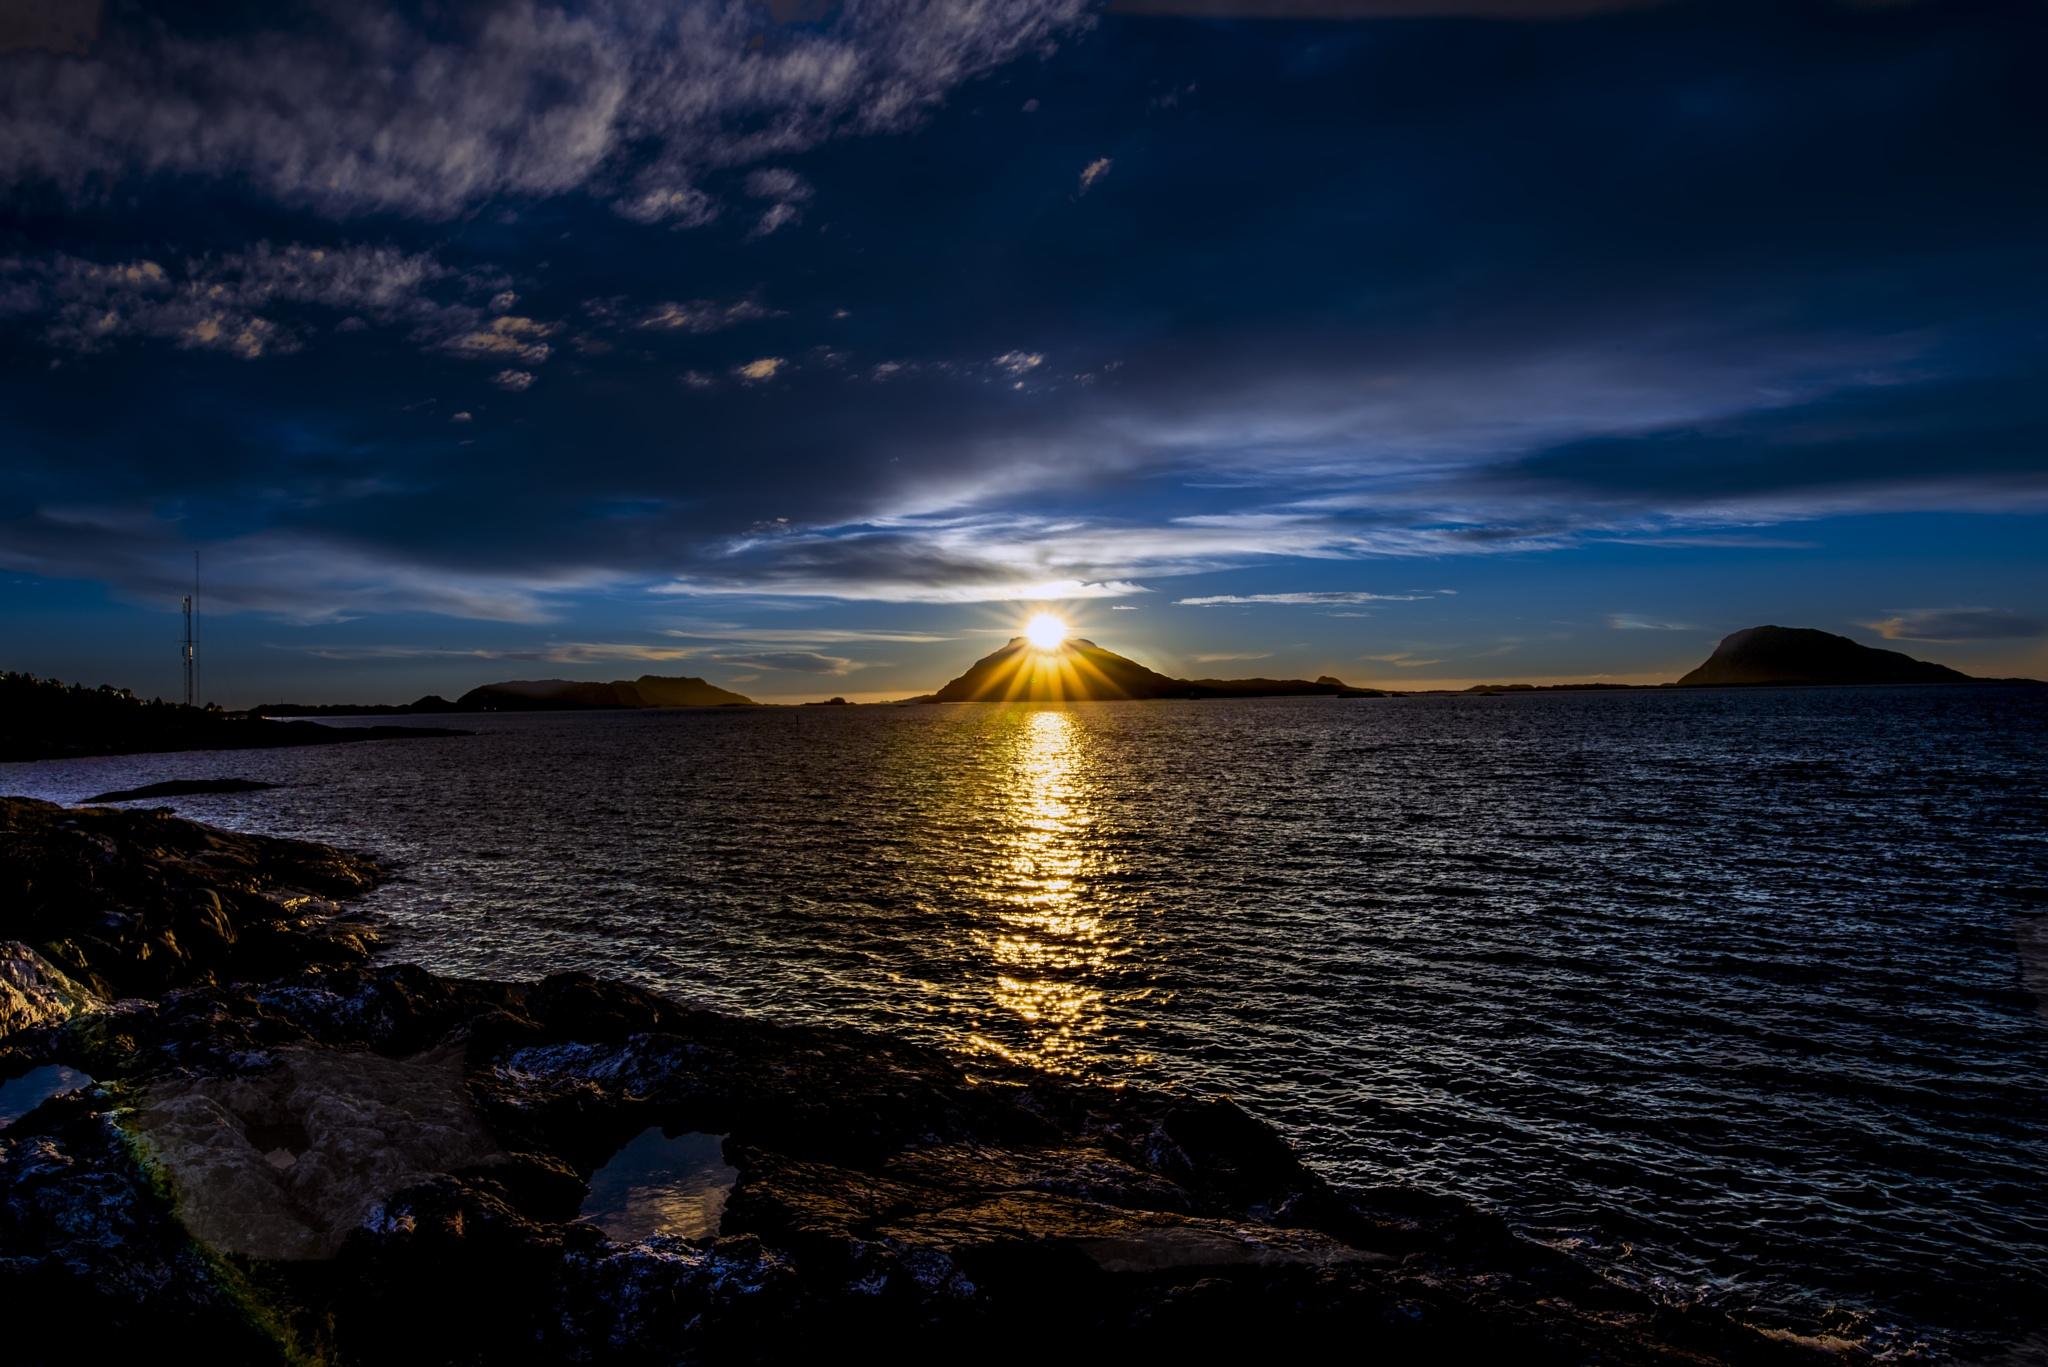 The sun set in Florø by Stian Olaisen